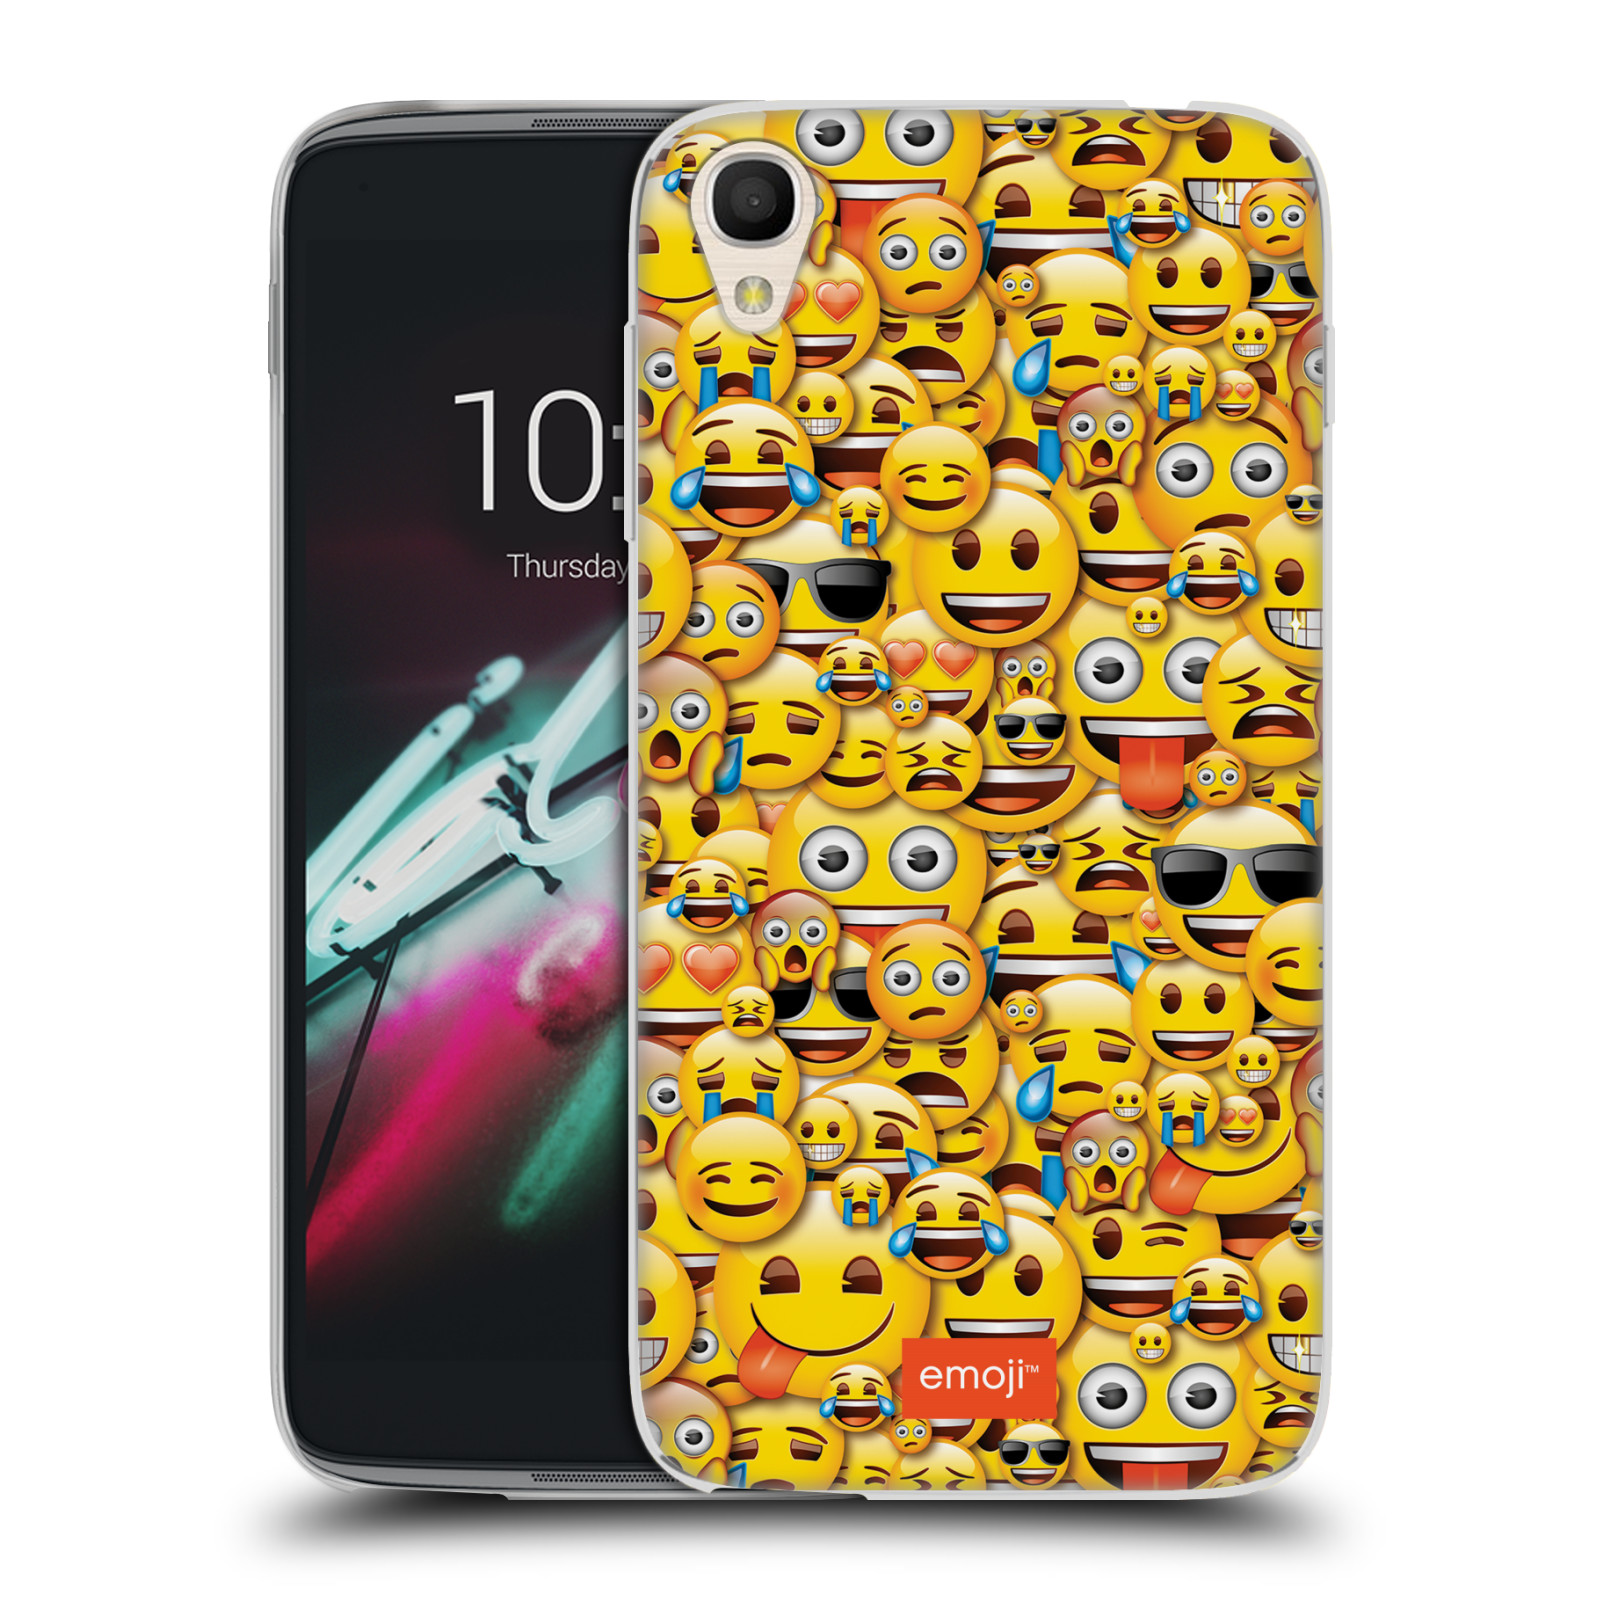 "Silikonové pouzdro na mobil Alcatel One Touch 6039Y Idol 3 HEAD CASE EMOJI - Mnoho malých smajlíků (Silikonový kryt či obal s oficiálním motivem EMOJI na mobilní telefon Alcatel One Touch Idol 3 OT-6039Y s 4,7"" displejem)"